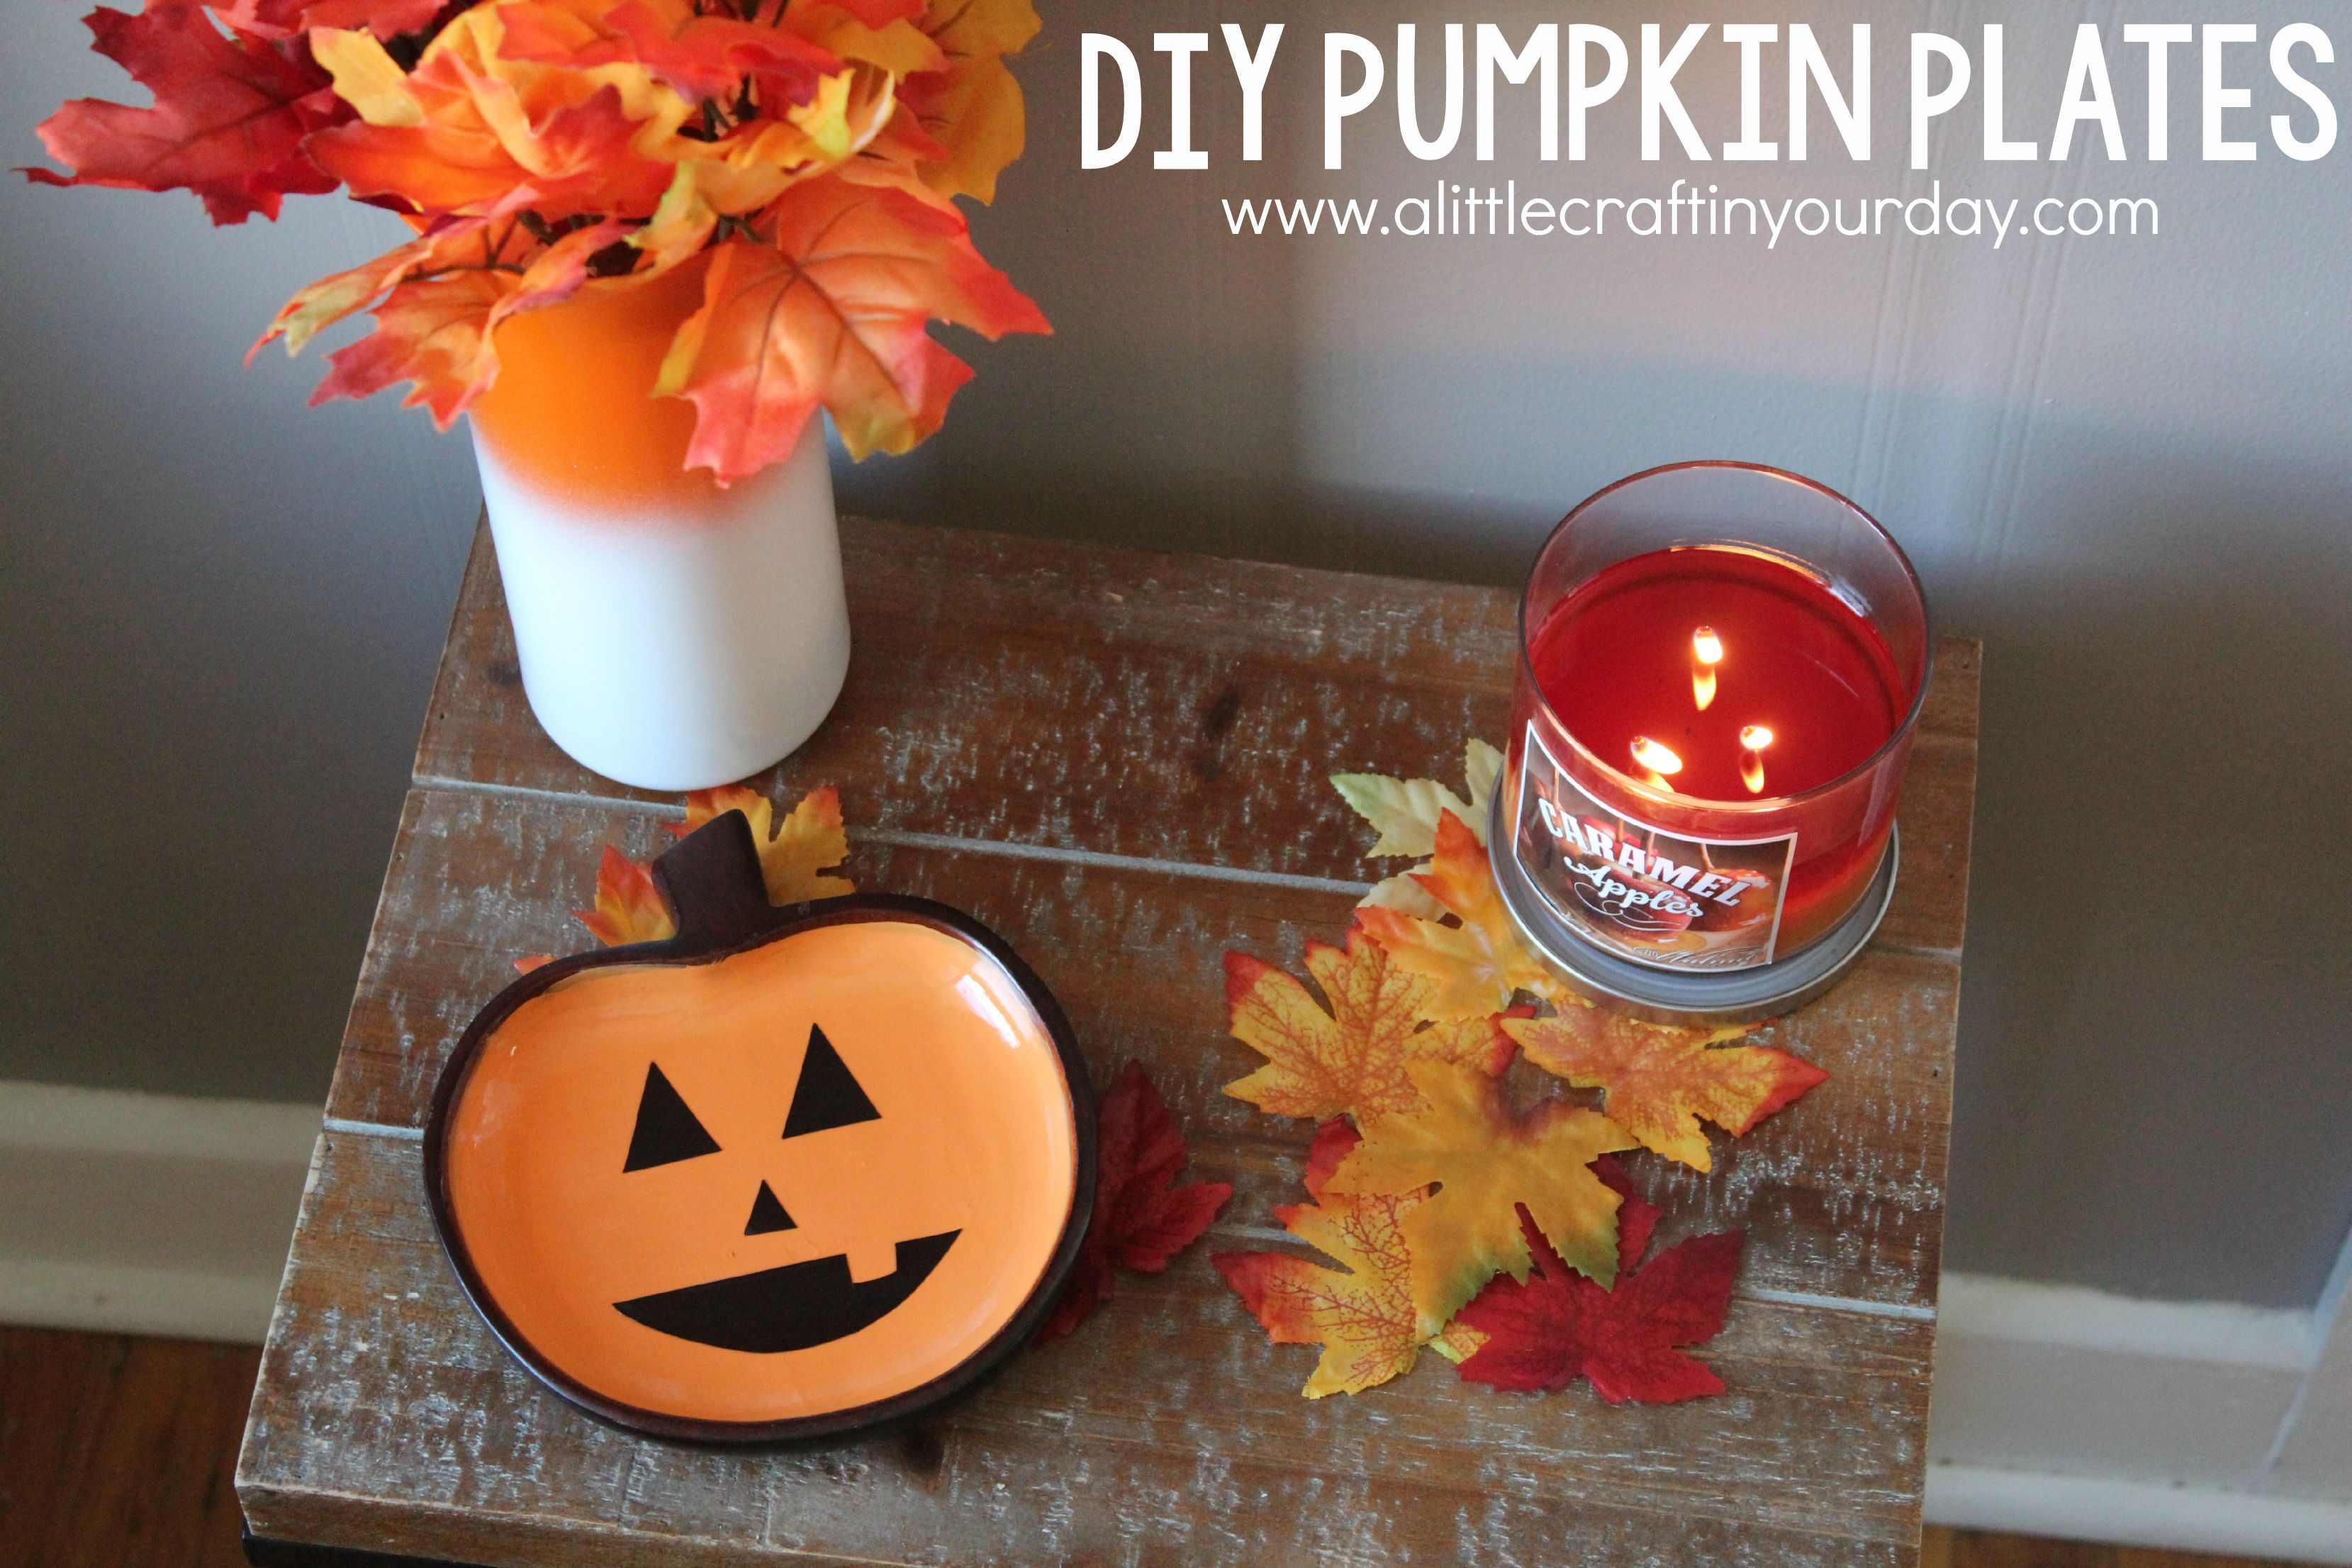 DIY Pumpkin Plates